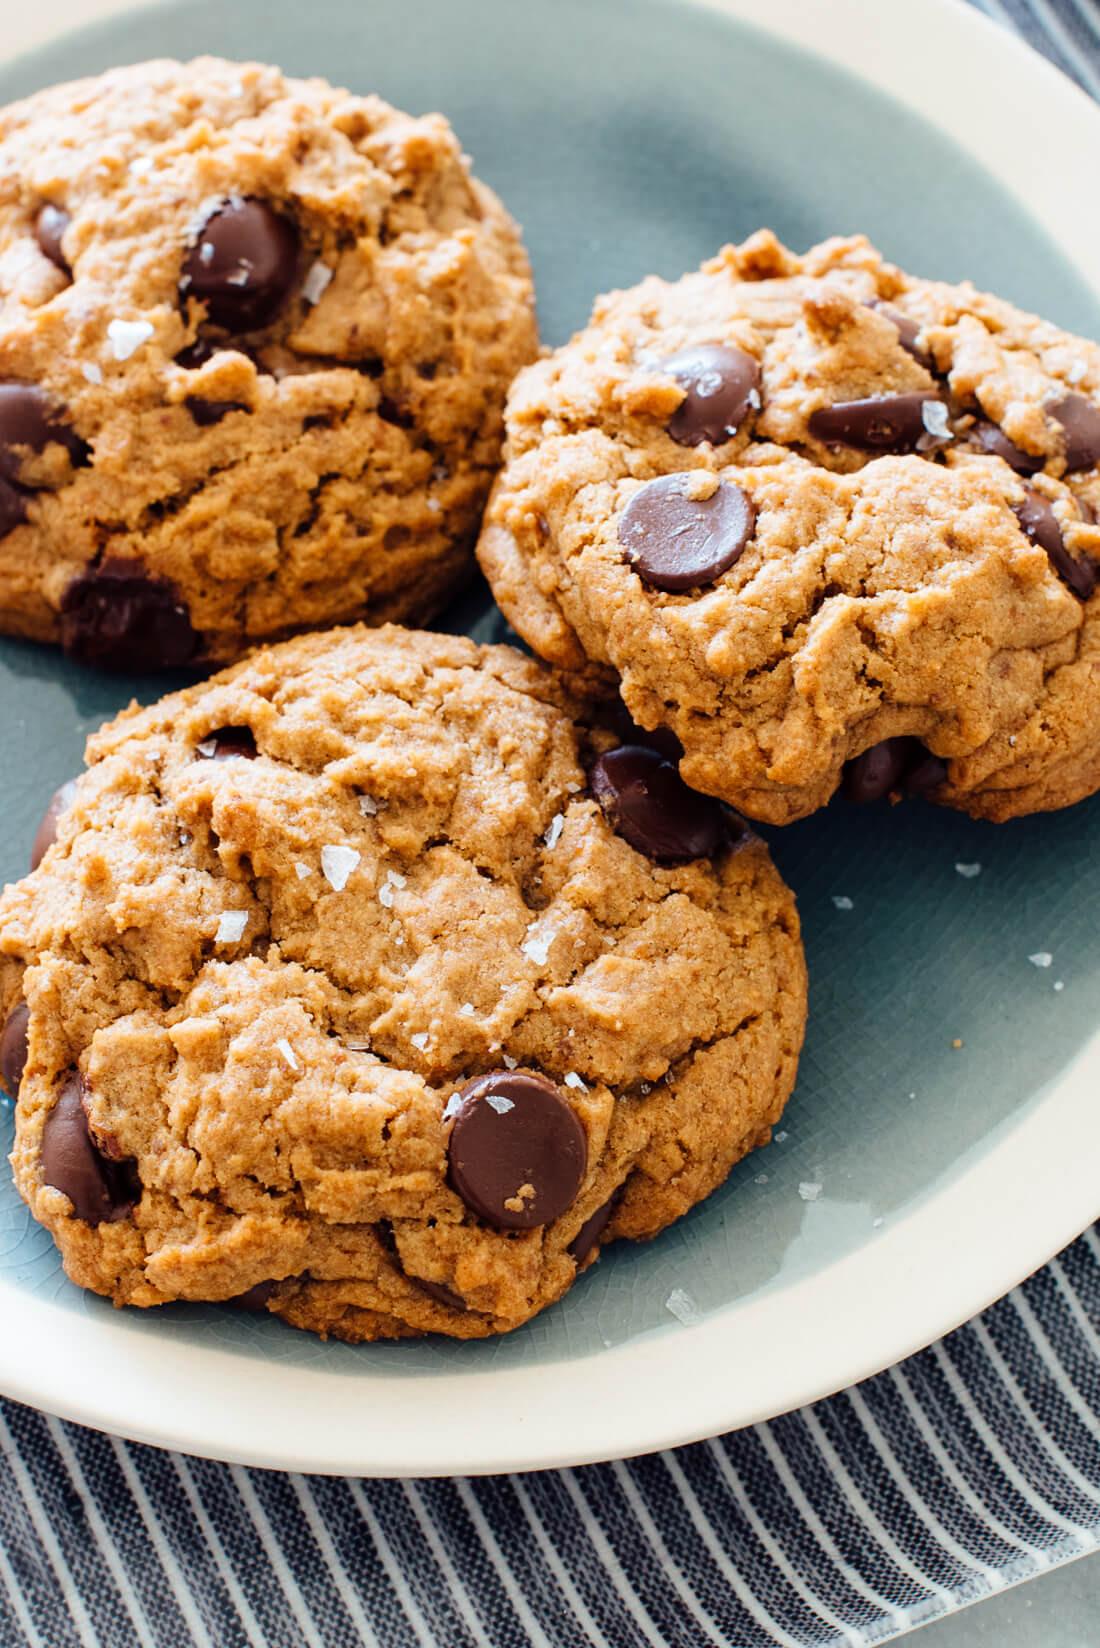 Vegan Chocolate Chip Cookies Recipe  Vegan Chocolate Chip Cookies Recipe — Dishmaps